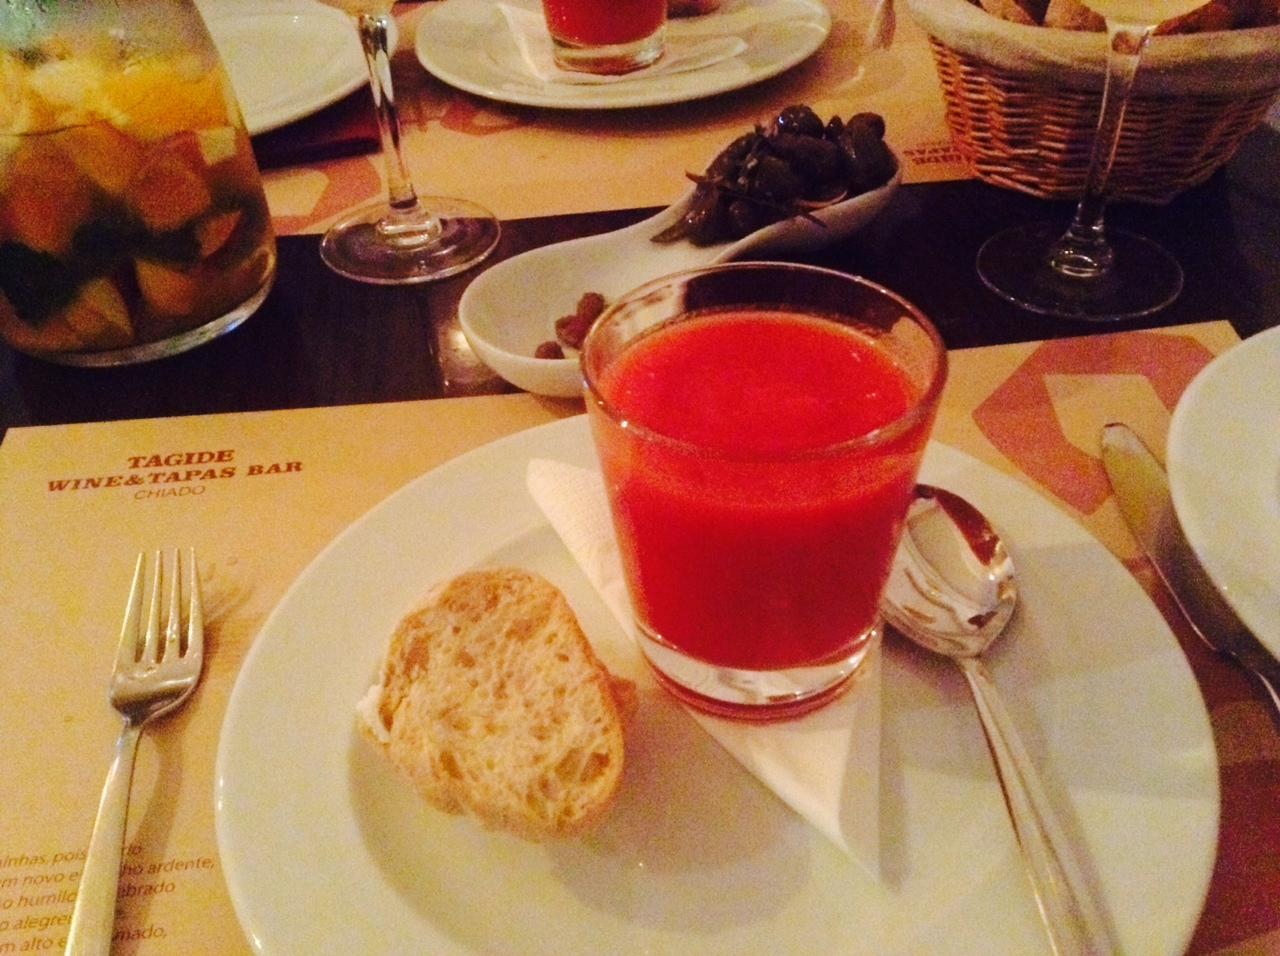 Meilleur Restaurant Bresilien Lisbonne